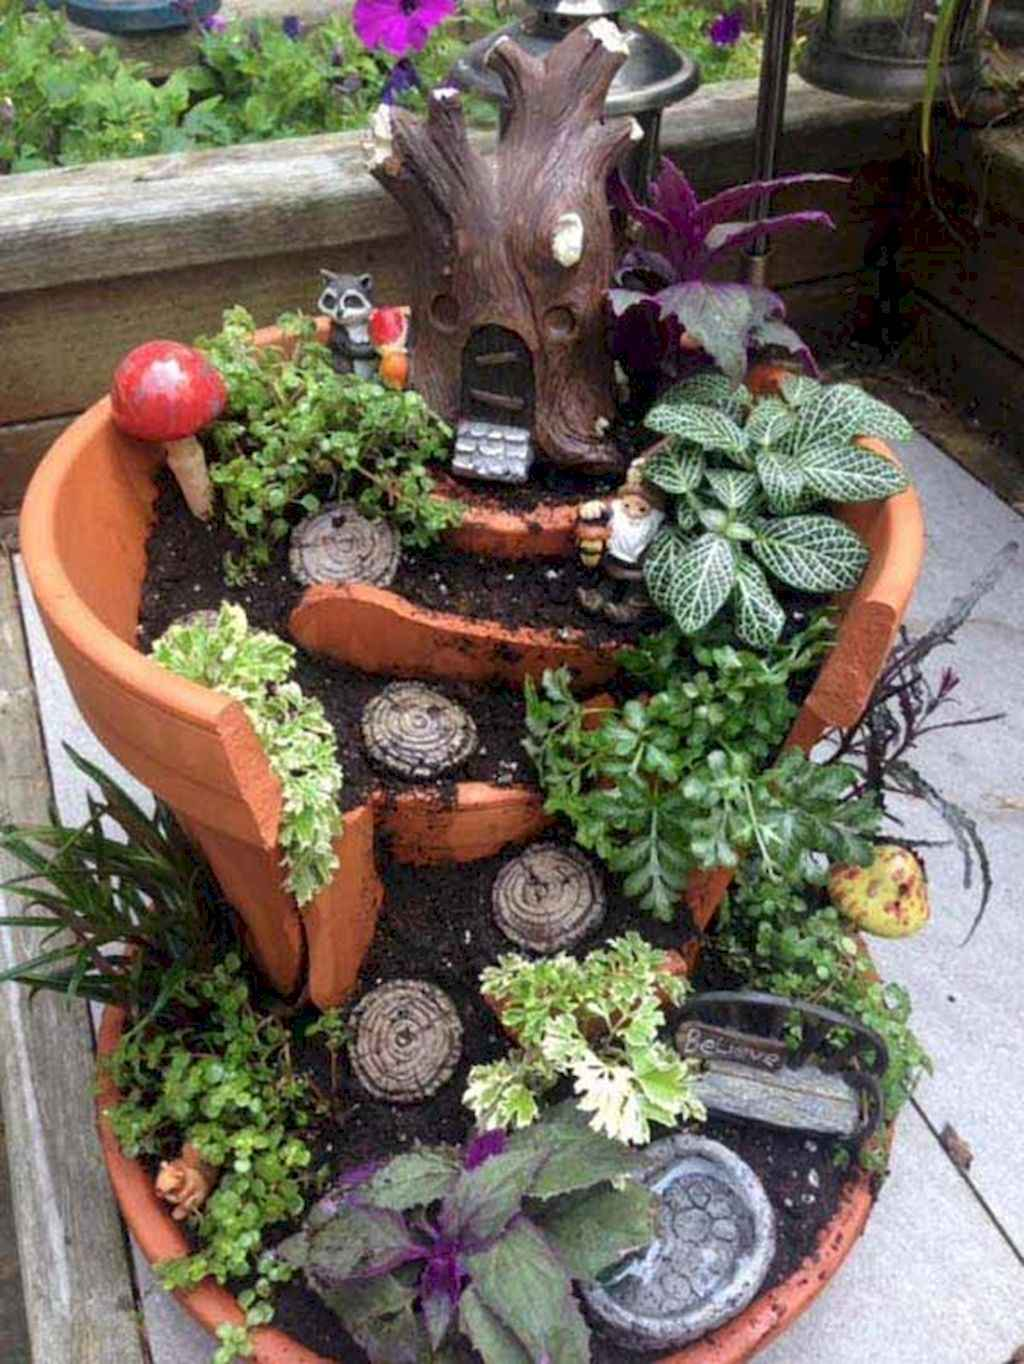 50 beautiful diy fairy garden design ideas 34 - Fairy Garden Design Ideas